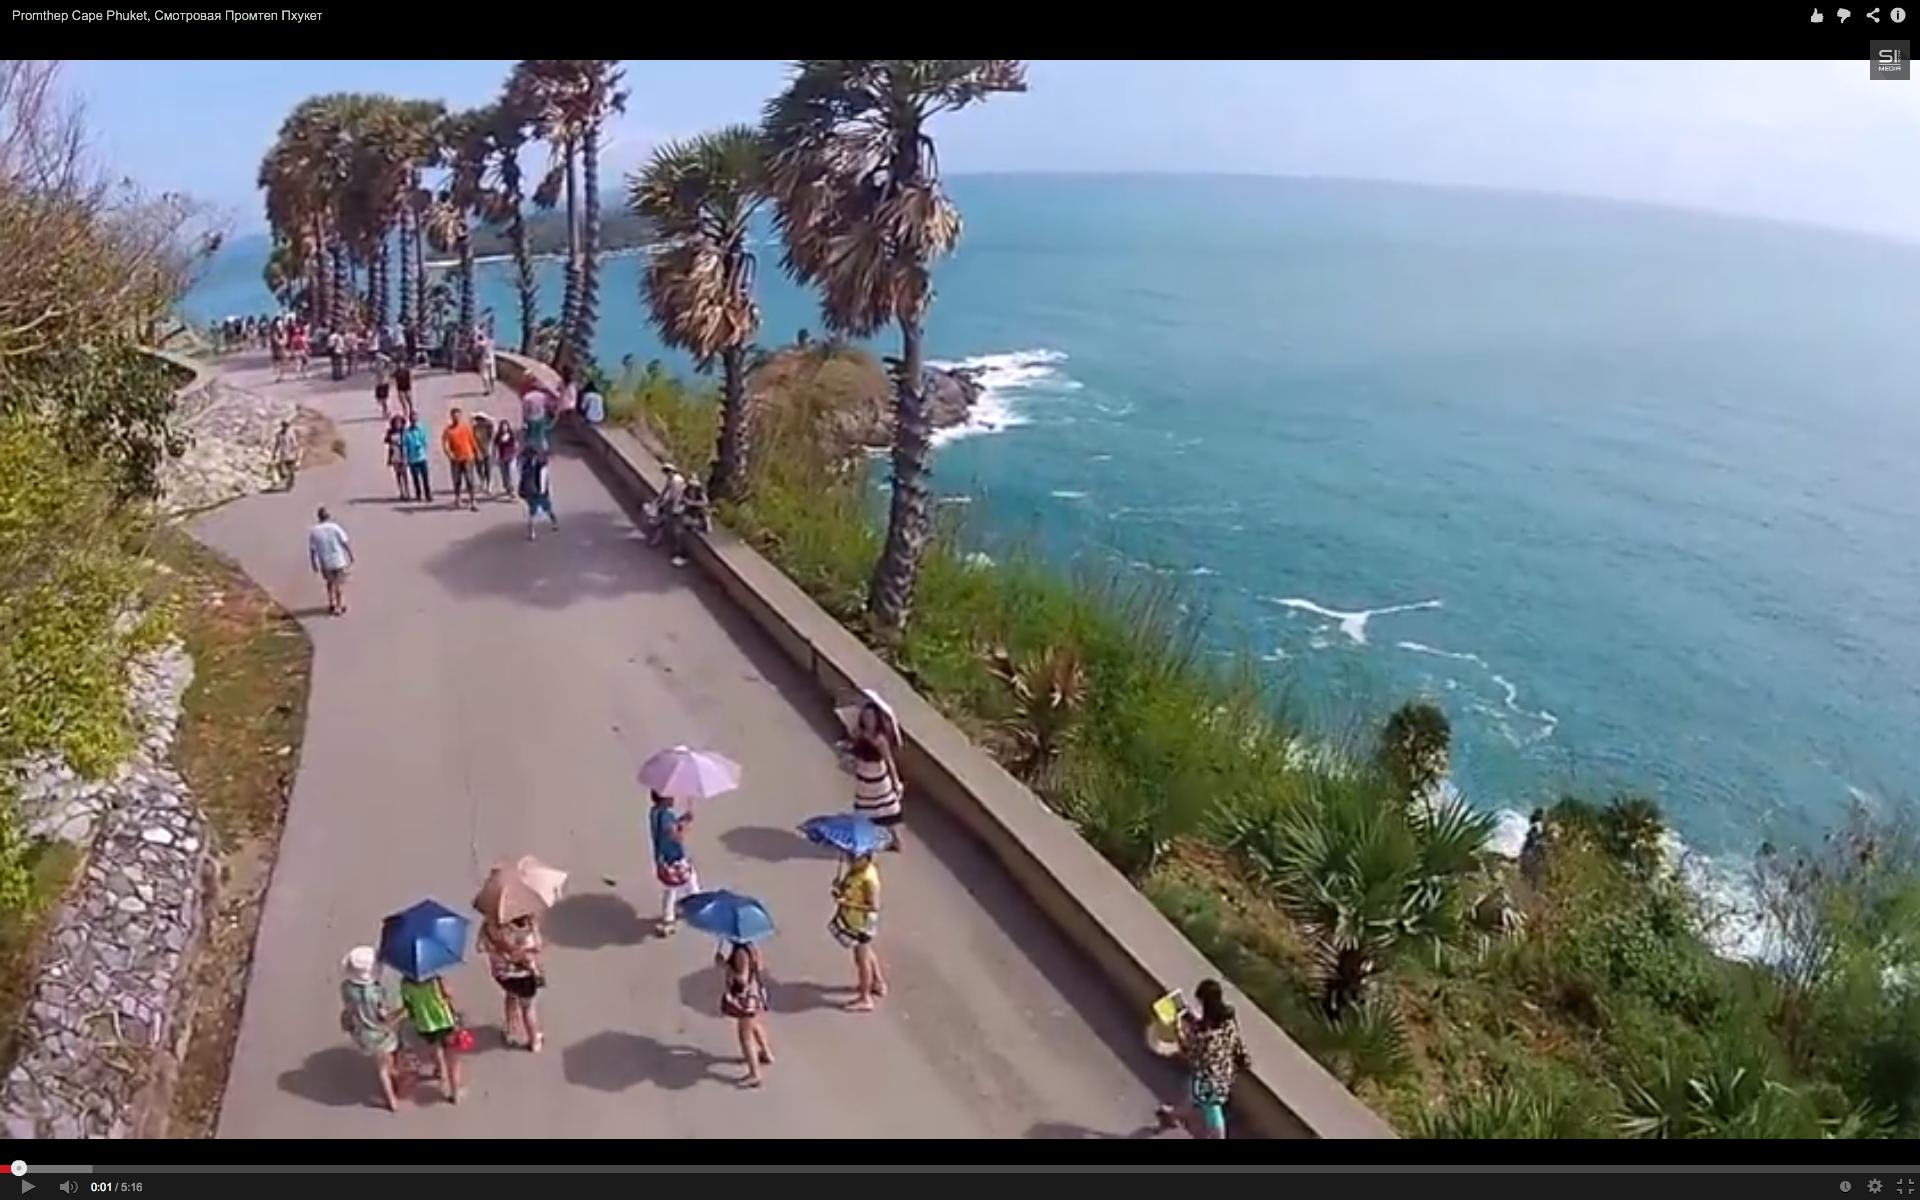 Vídeos Tailândia, Phuket cénico terraço do Cabo Promthep Phuket, Promthep Cape Phuket